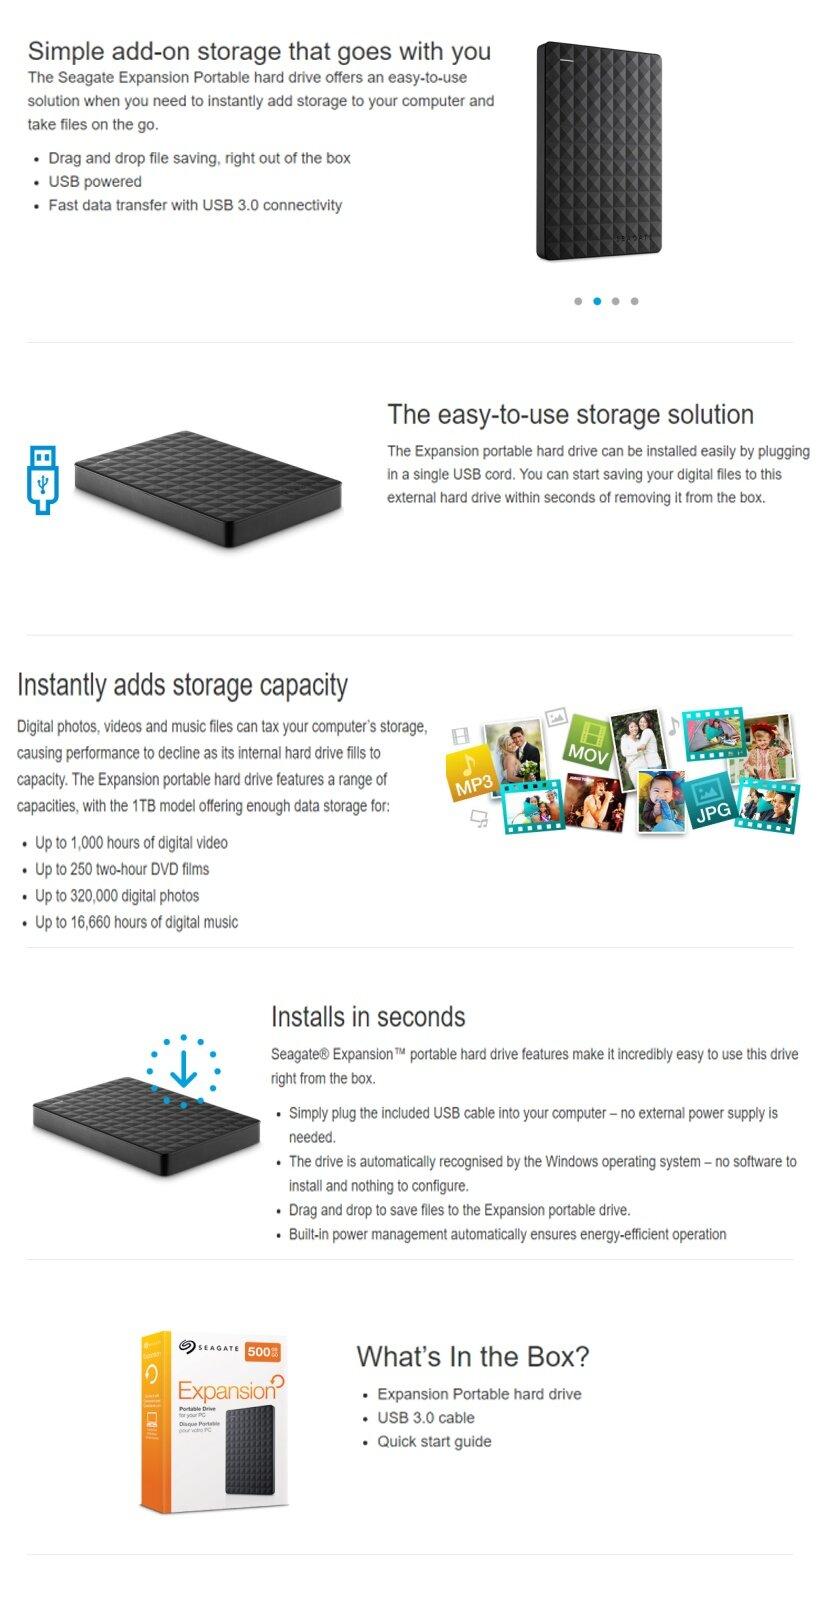 Seagate Expansion Portable Drive 15tb Lazada External 1tb Spesifikasi Oleh